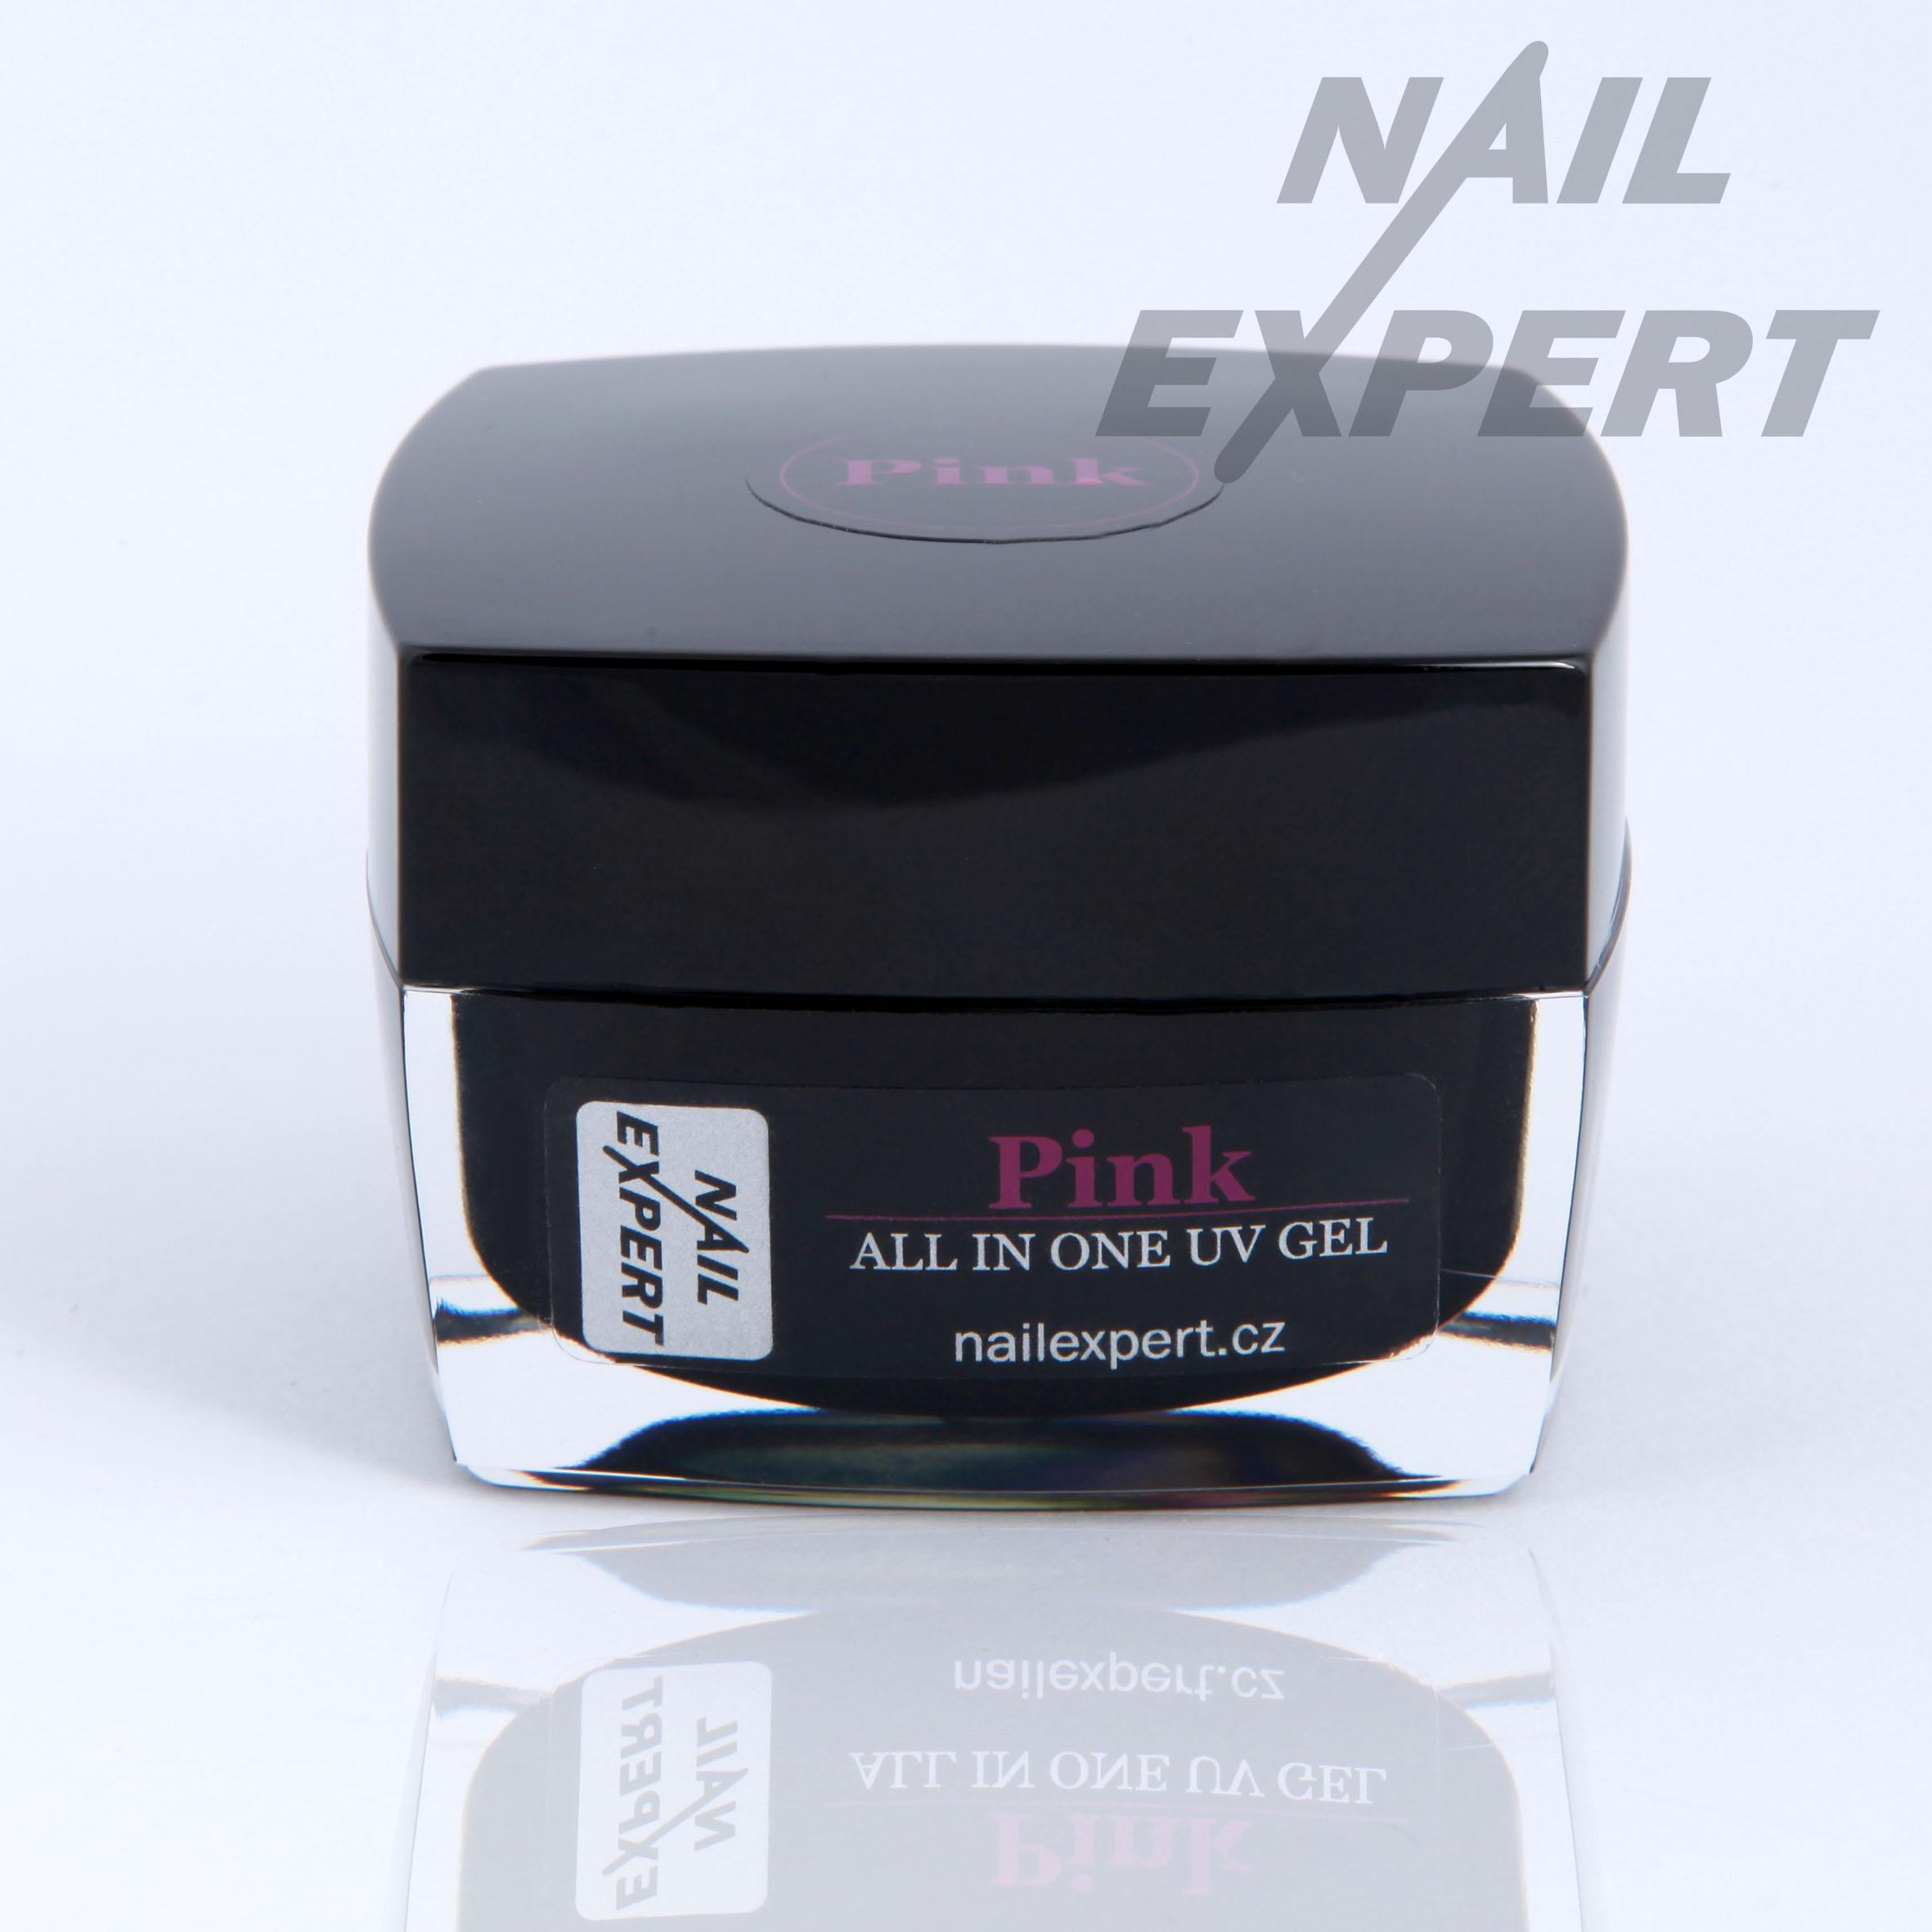 Nail Expert PINK jednofázový UV gel 100ml